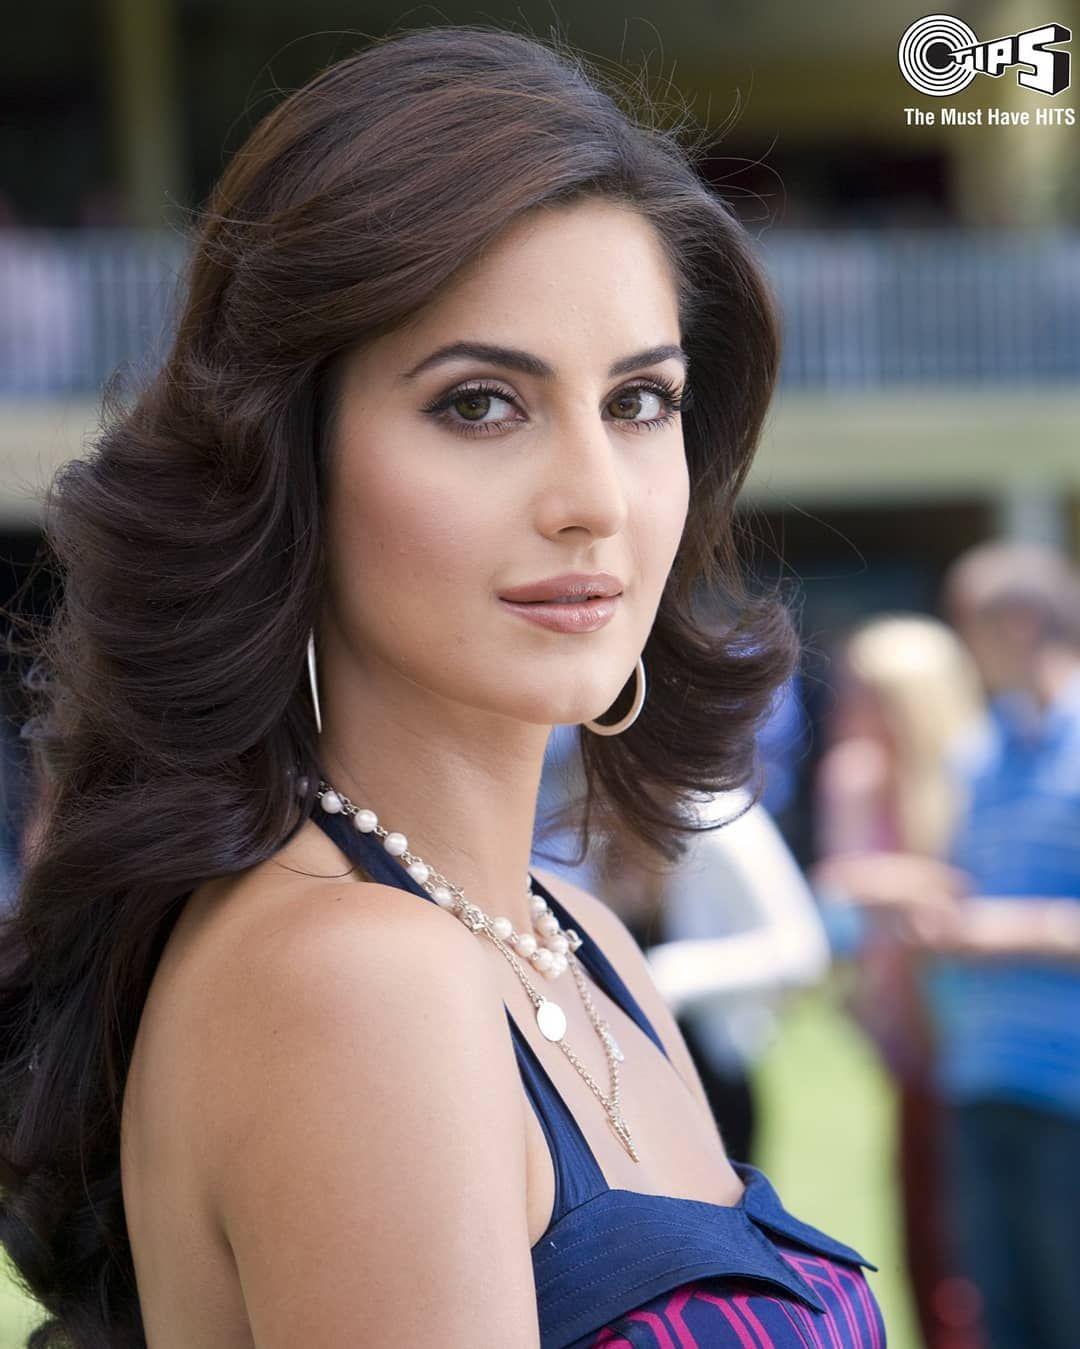 156 Likes 3 Comments Katrina Kaif Katrina Kaif Ka Deewana On Instagram Old Is Gold Katrinakaif Aktris Bollywood Produk Kecantikan Selebritas